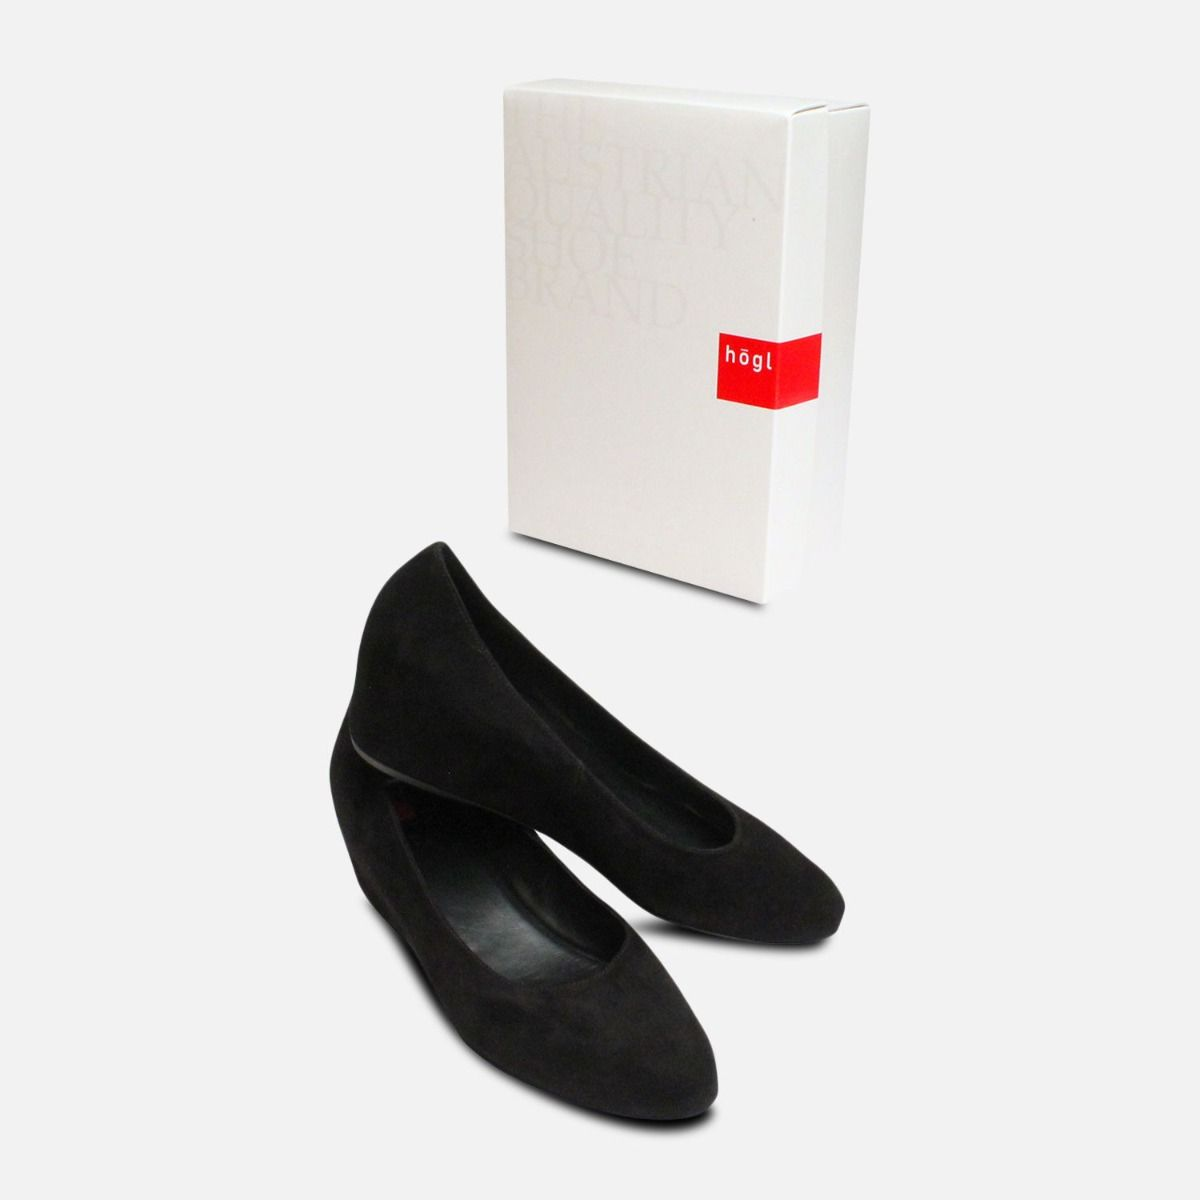 82cfa12f6c516 Hogl Black Suede Covered Wedge Ladies Shoes